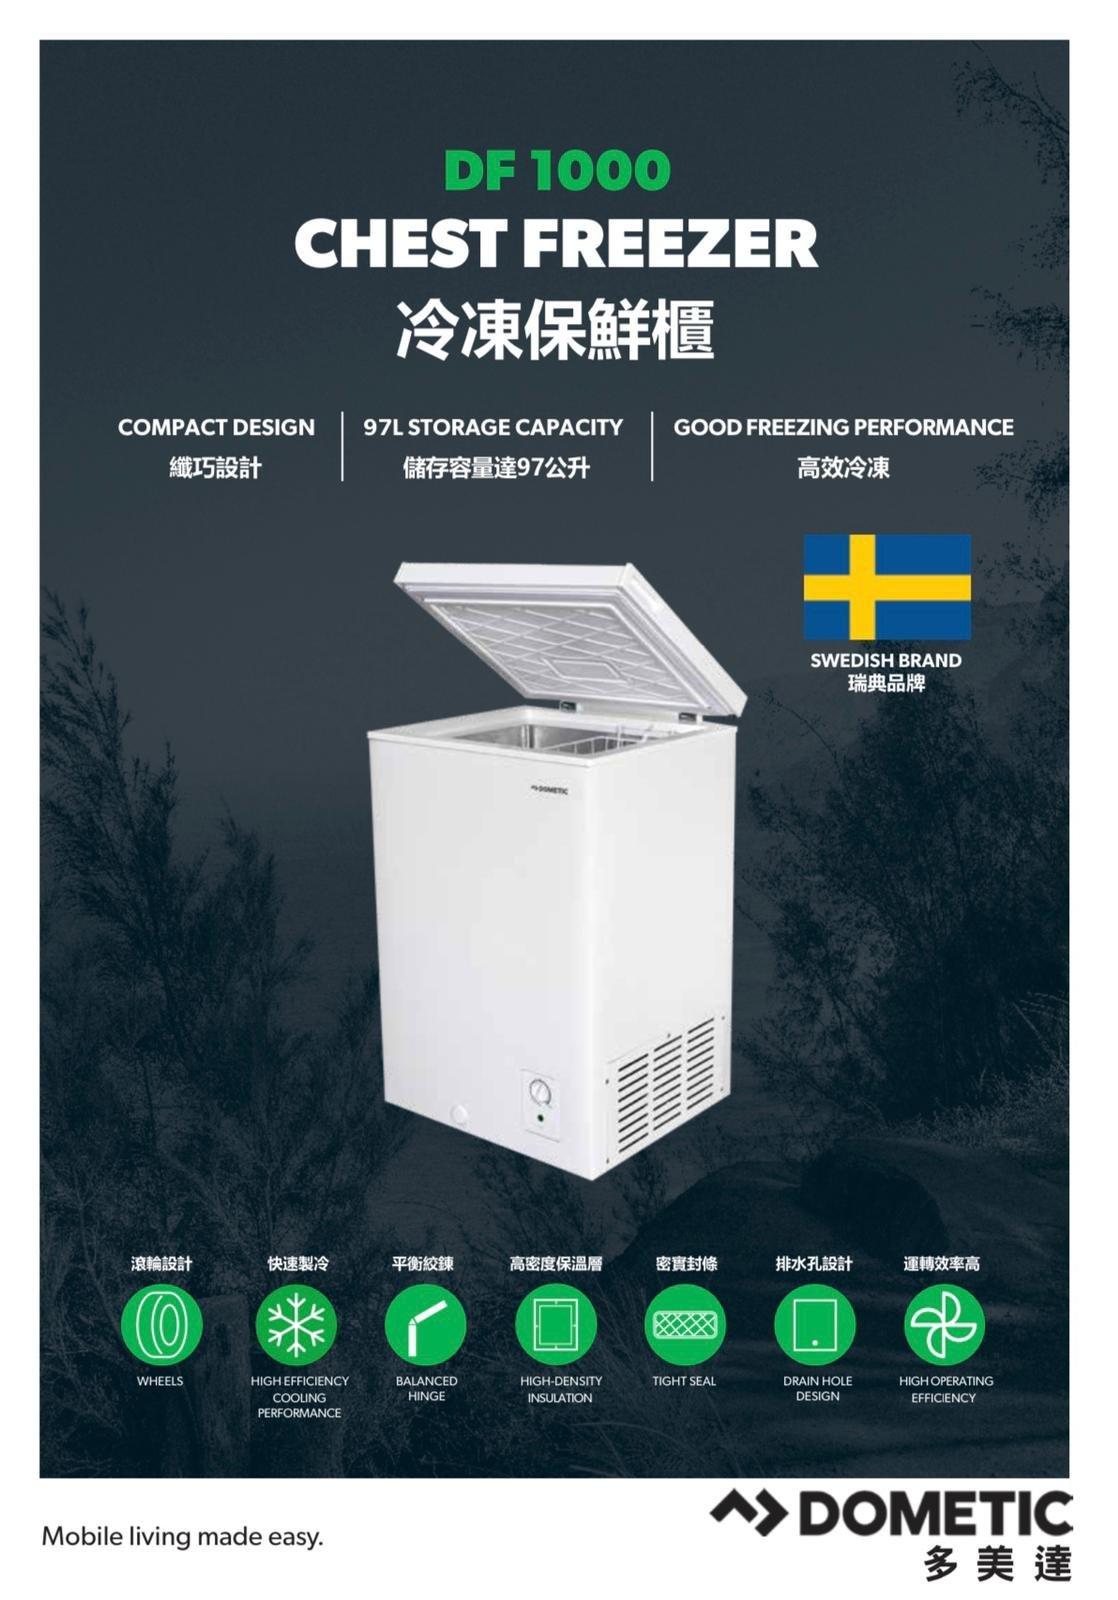 Dometic 多美達 DF1000 97公升 冰櫃